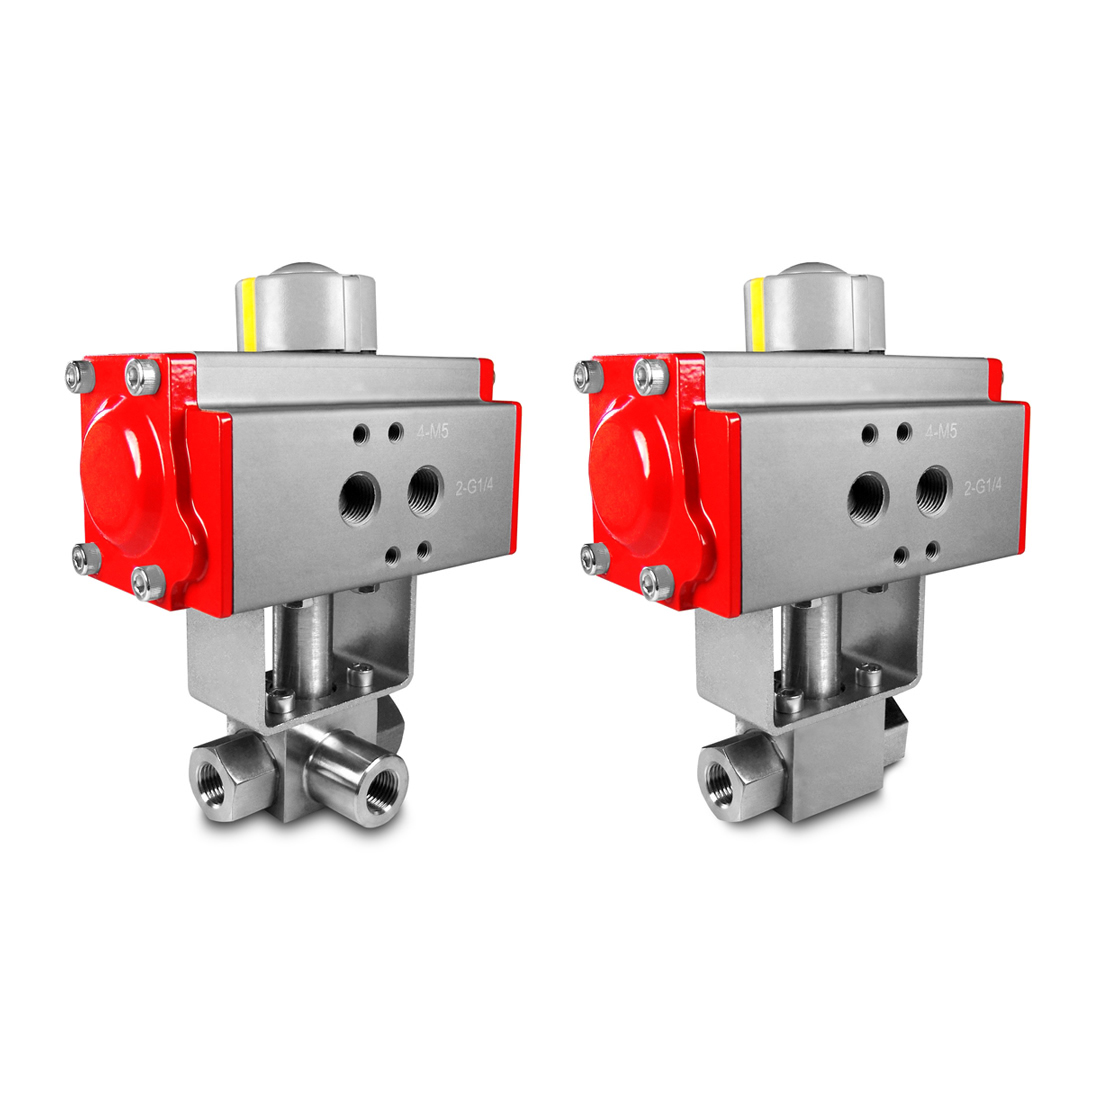 Valves with pneumatic actuator